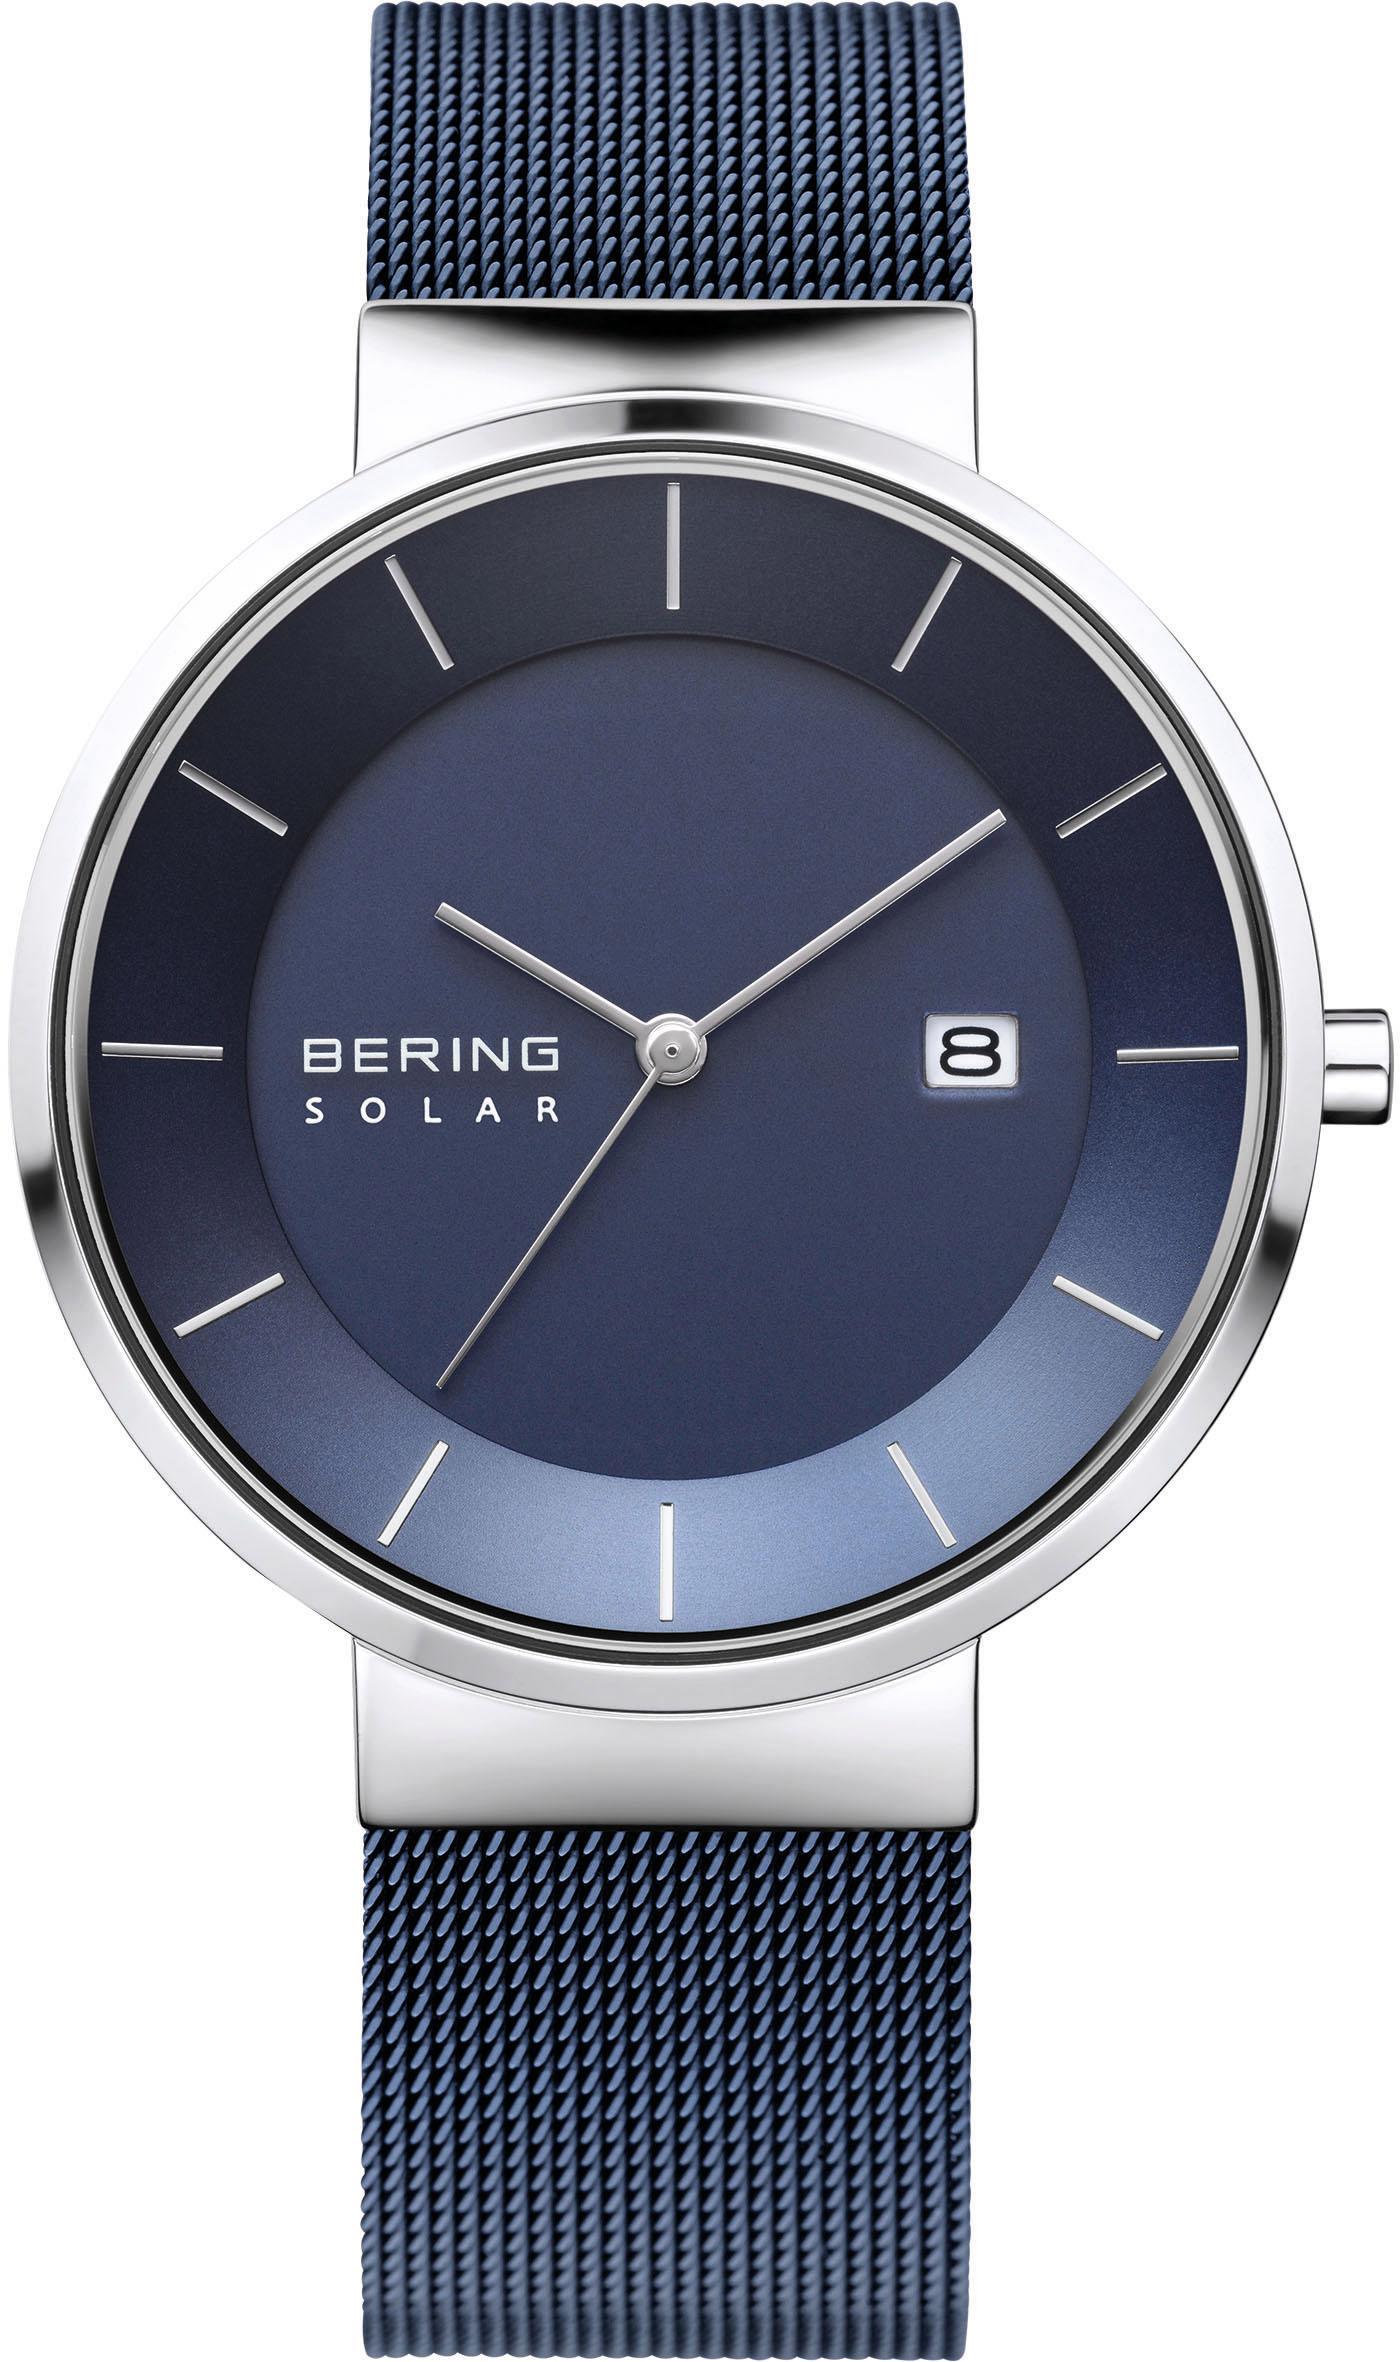 Bering Solaruhr »14639-307« | Uhren > Solaruhren | Blau | Bering